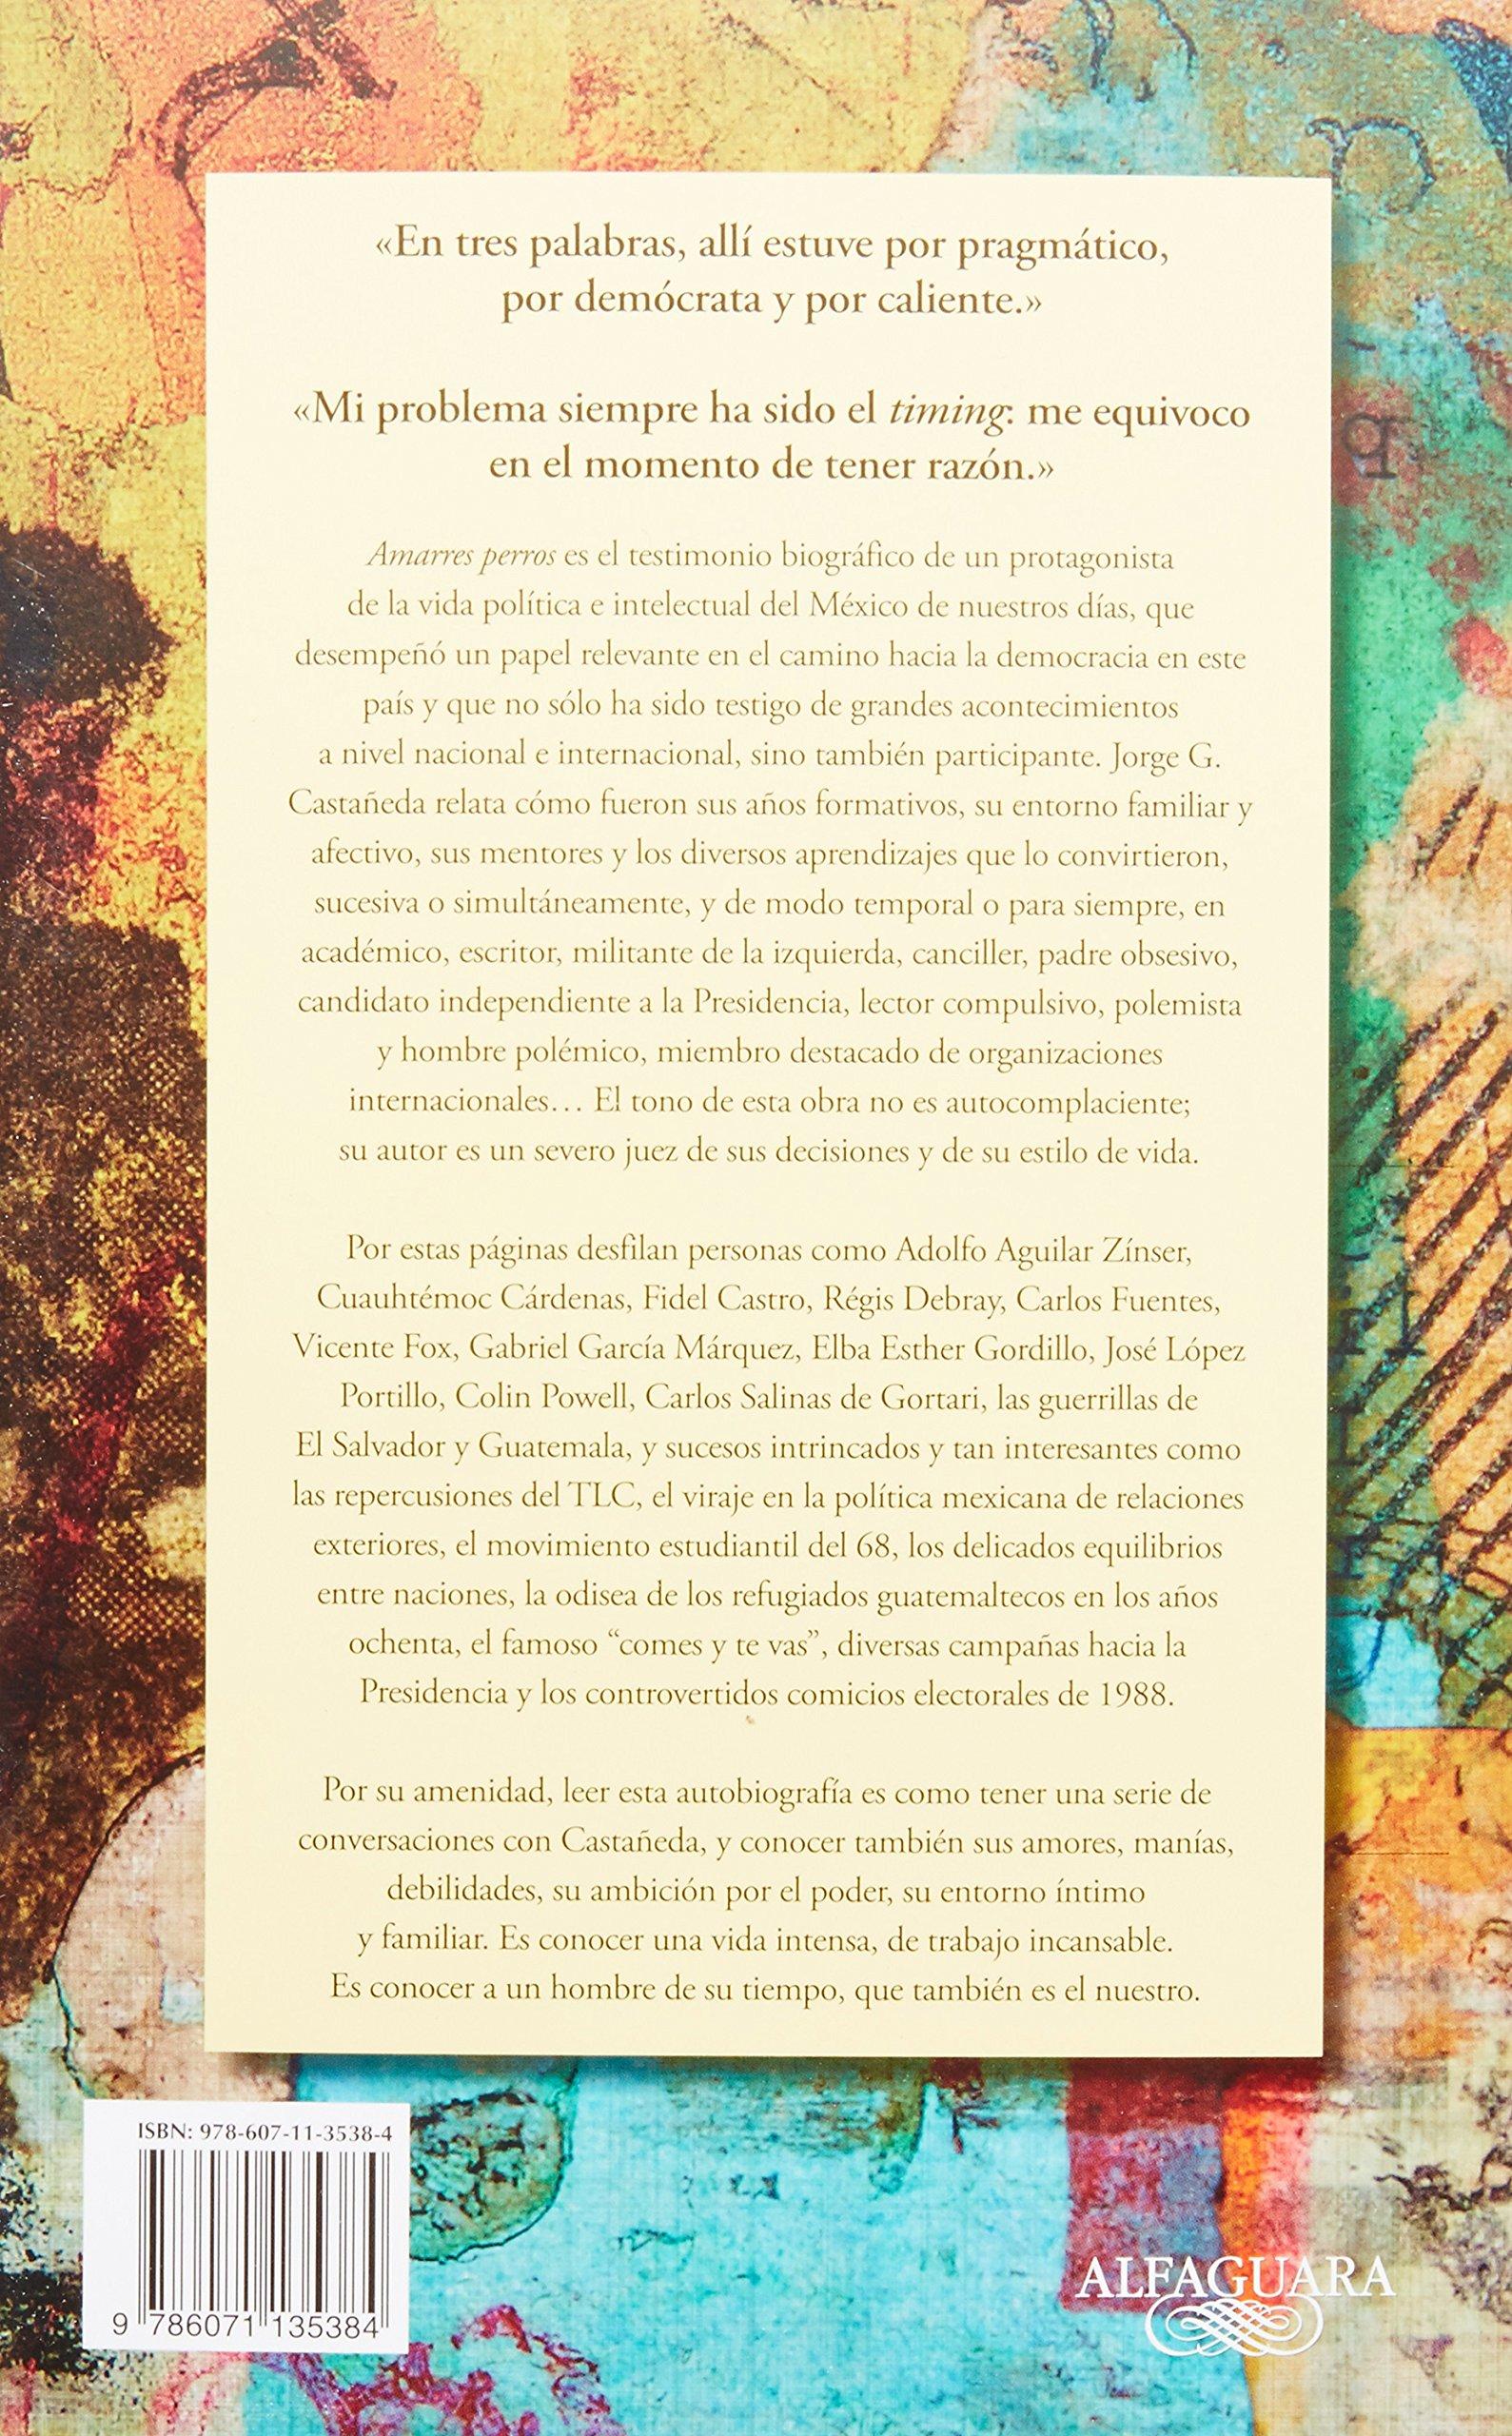 Amarres perros (Spanish Edition): Jorge G. Castaneda: 9786071135384: Amazon.com: Books